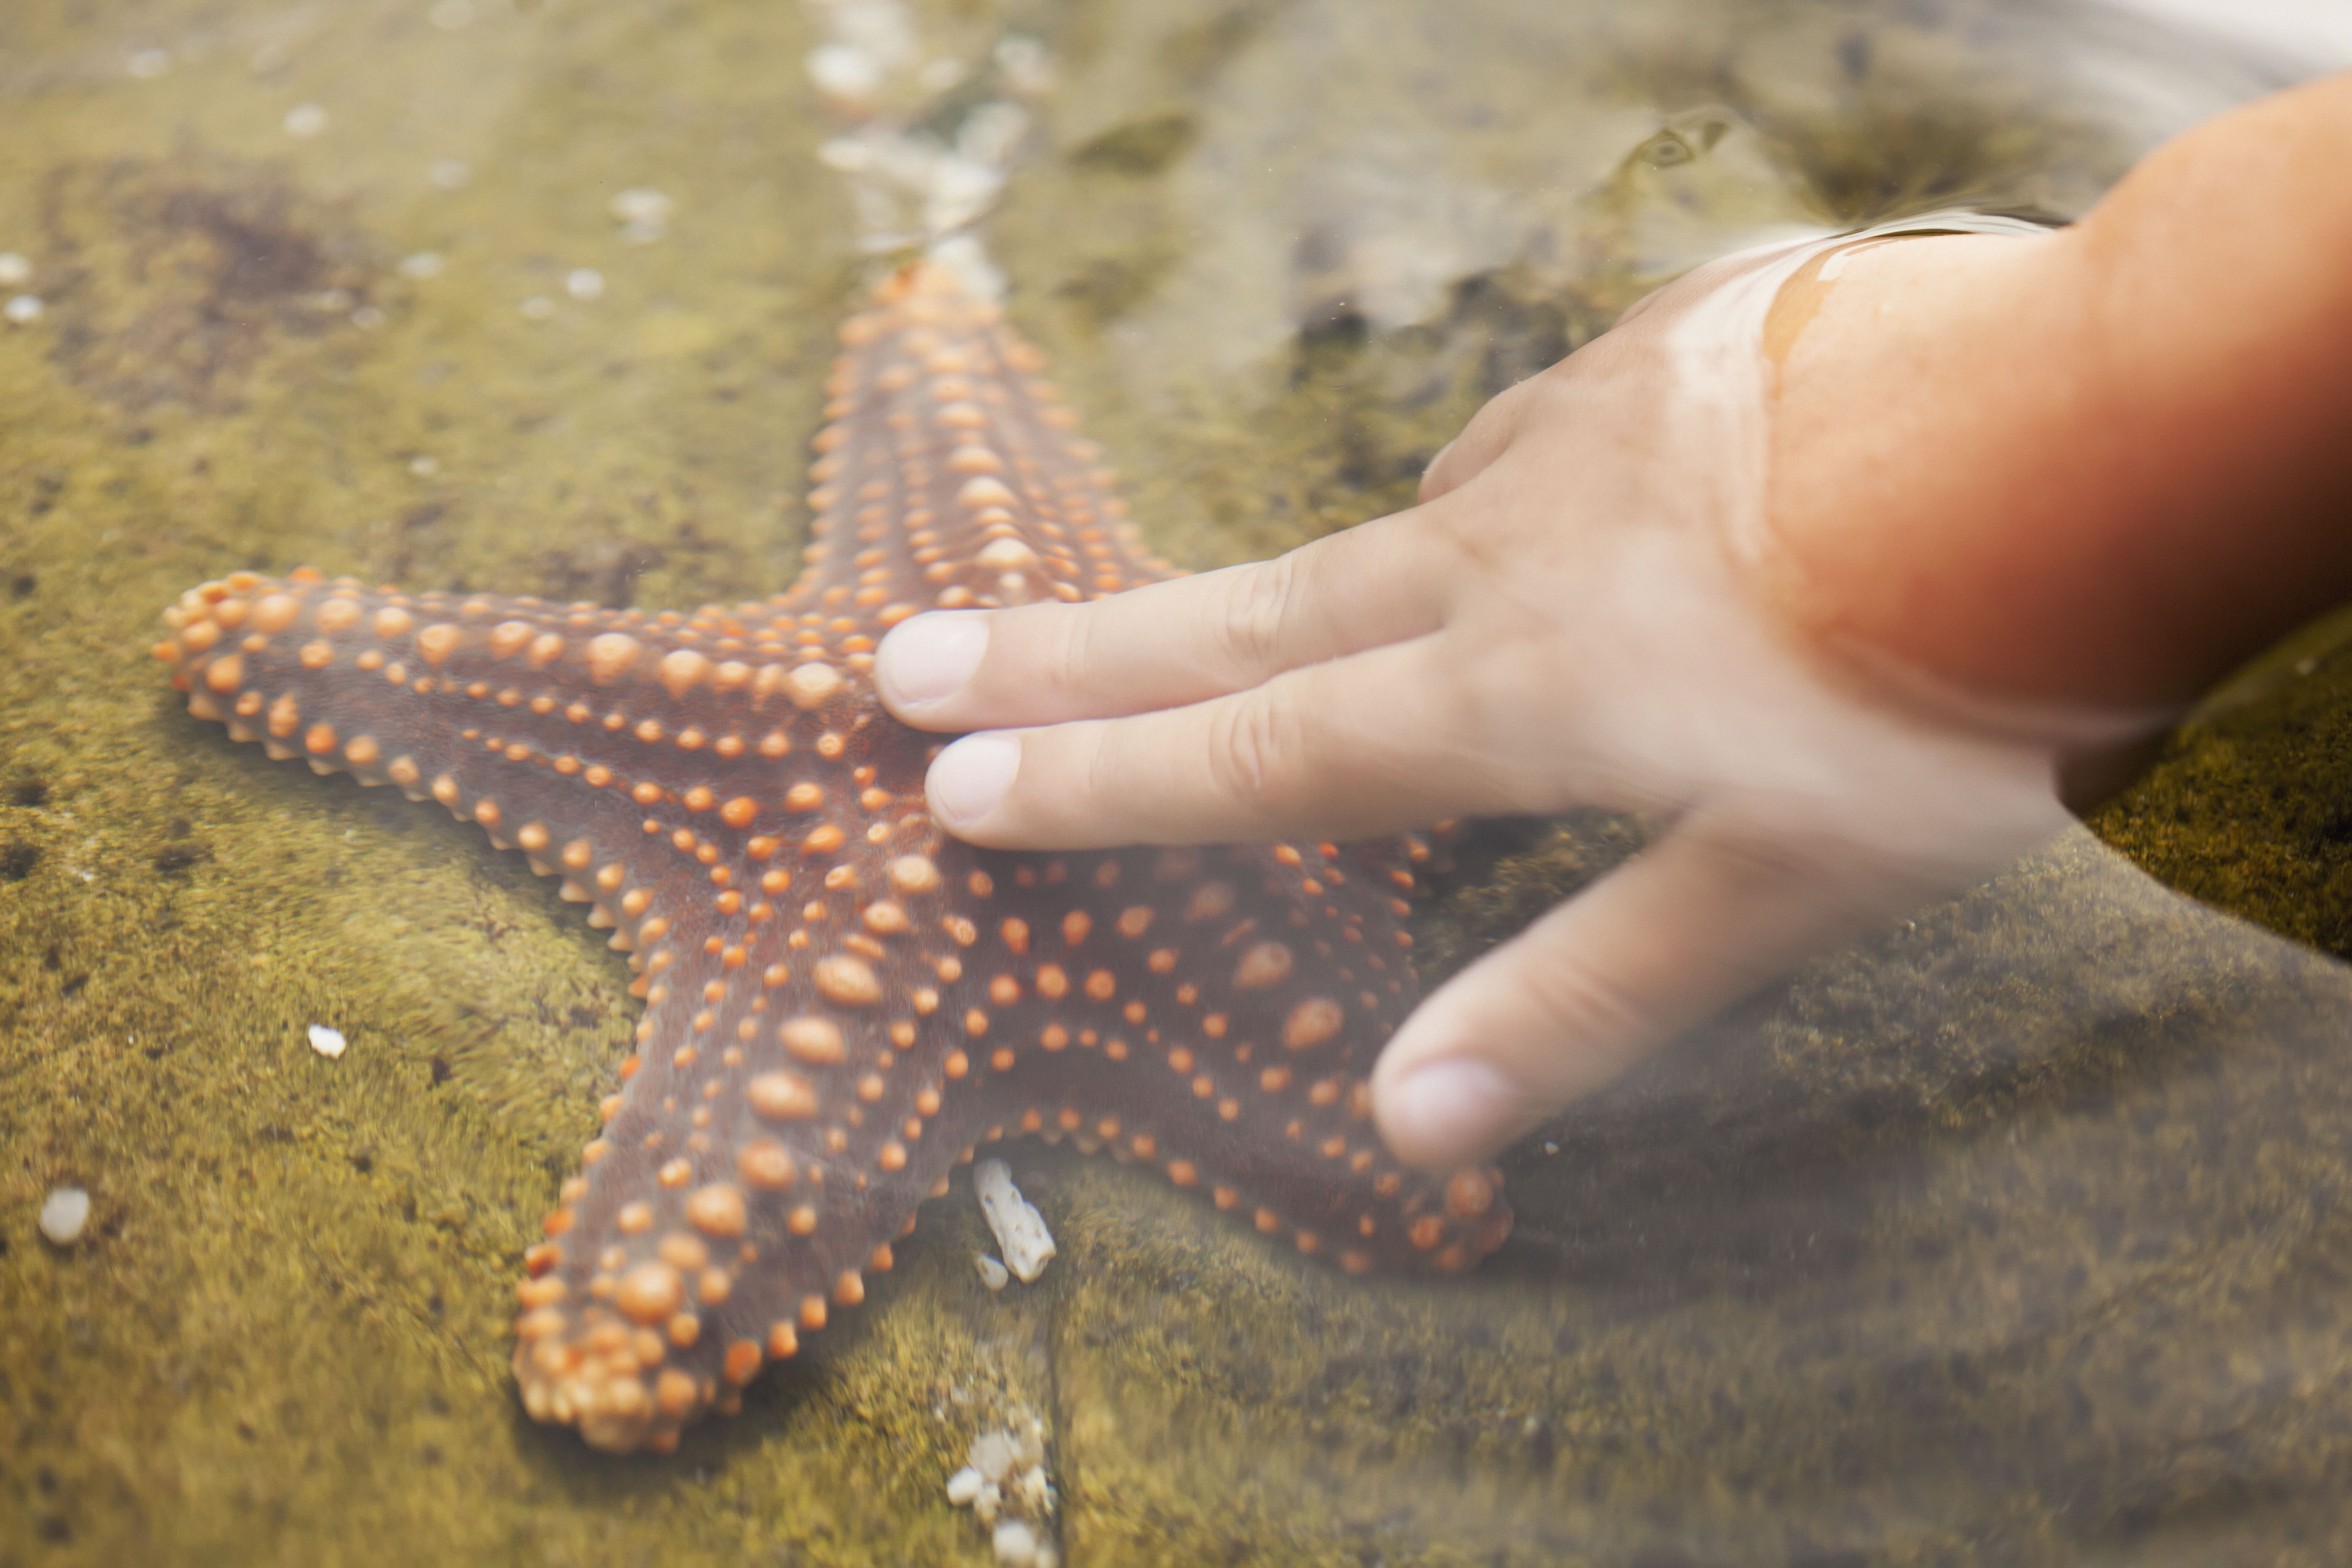 A Child's Hand Touching A Starfish